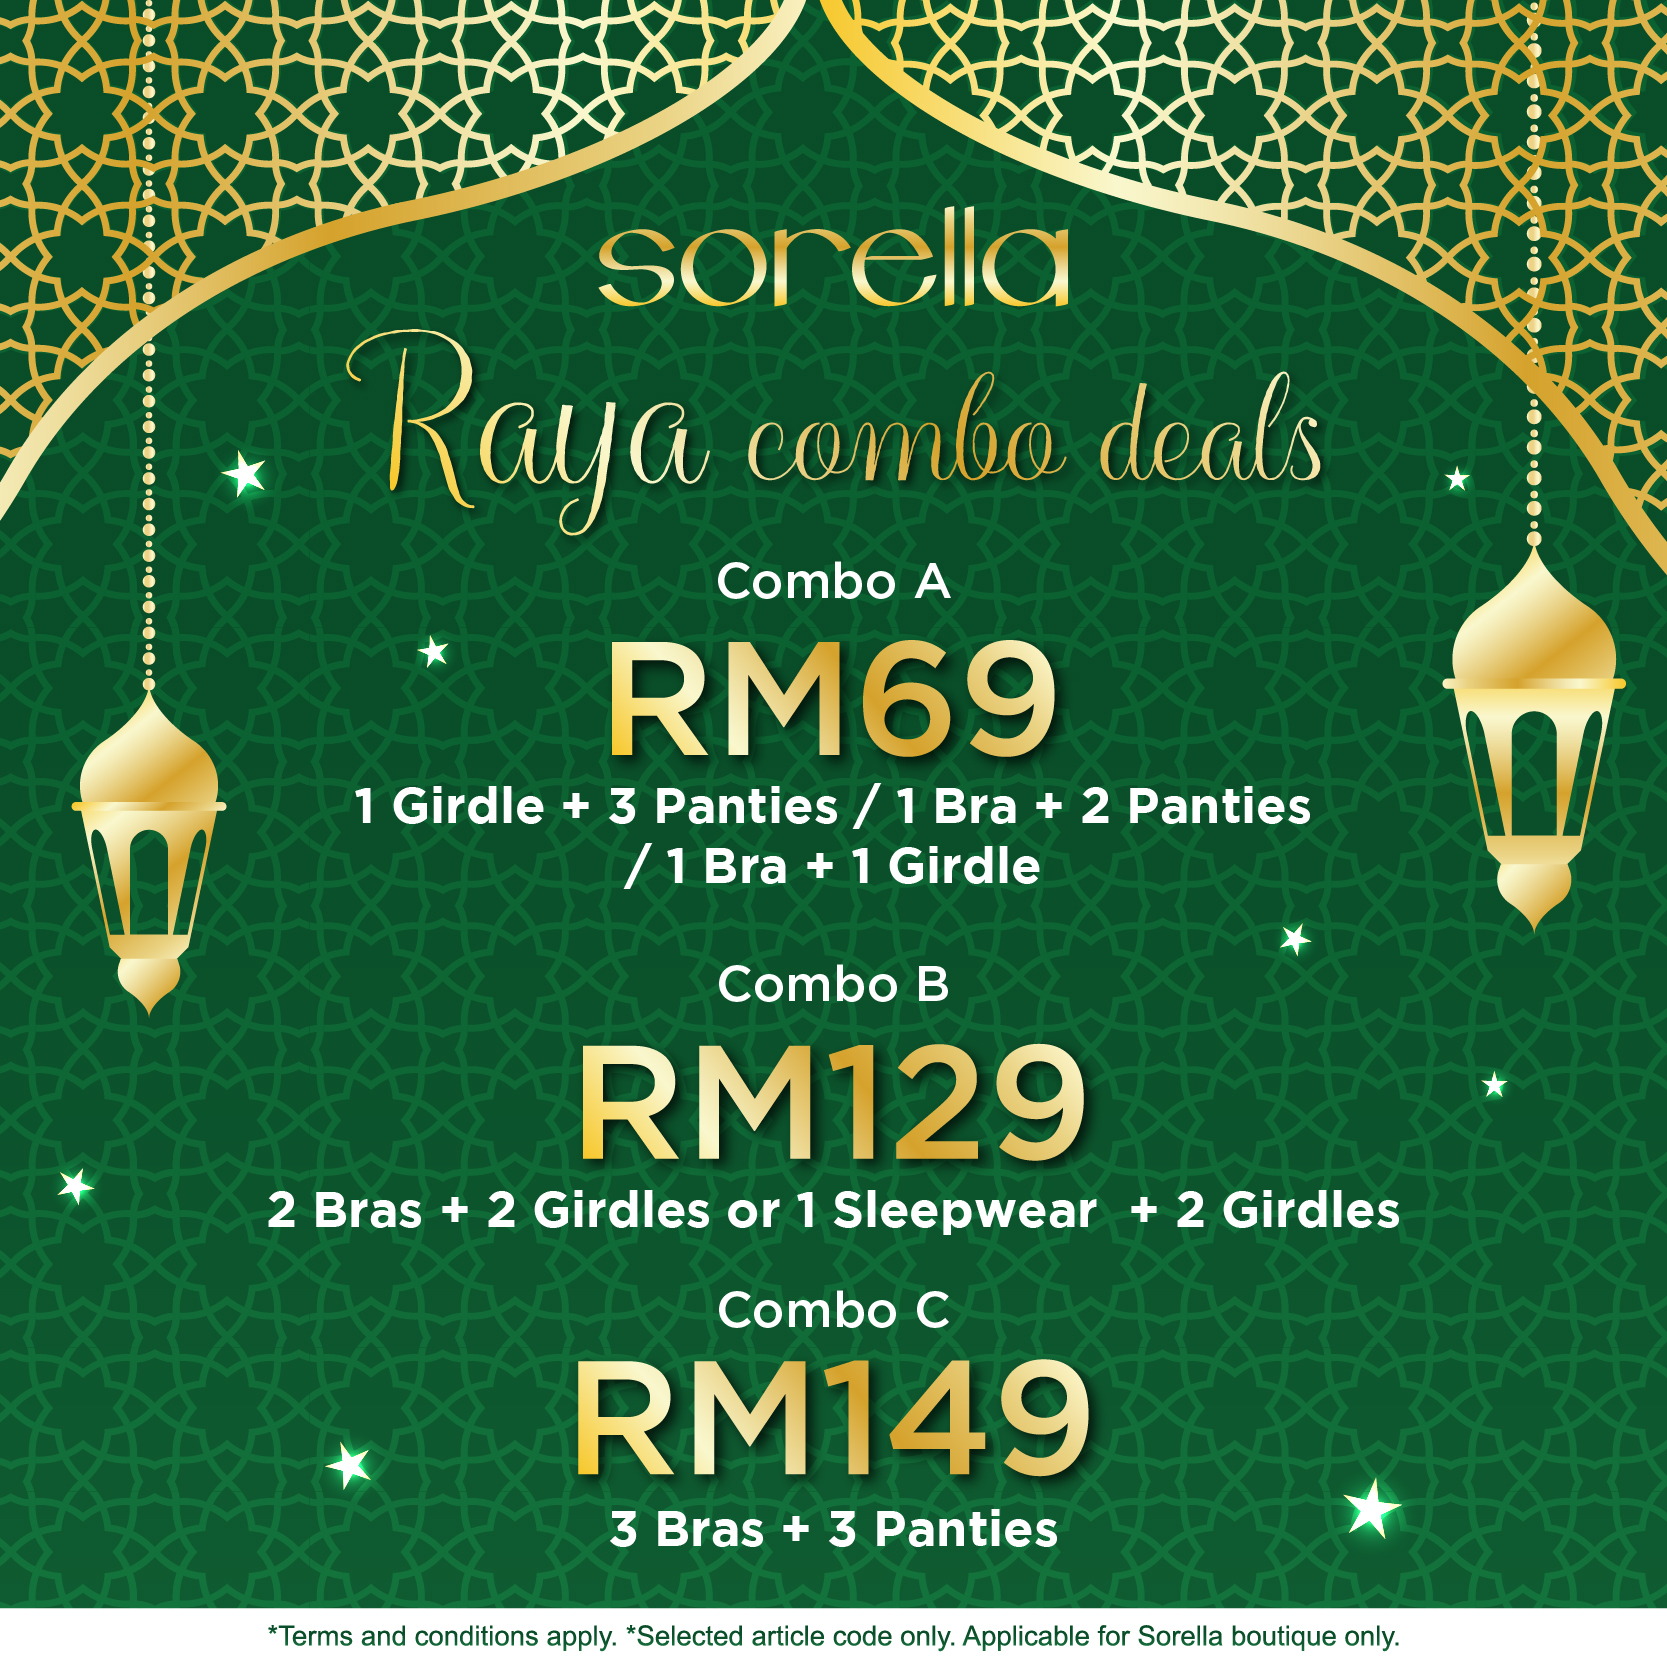 Raya_combo_deals_w800xh800px